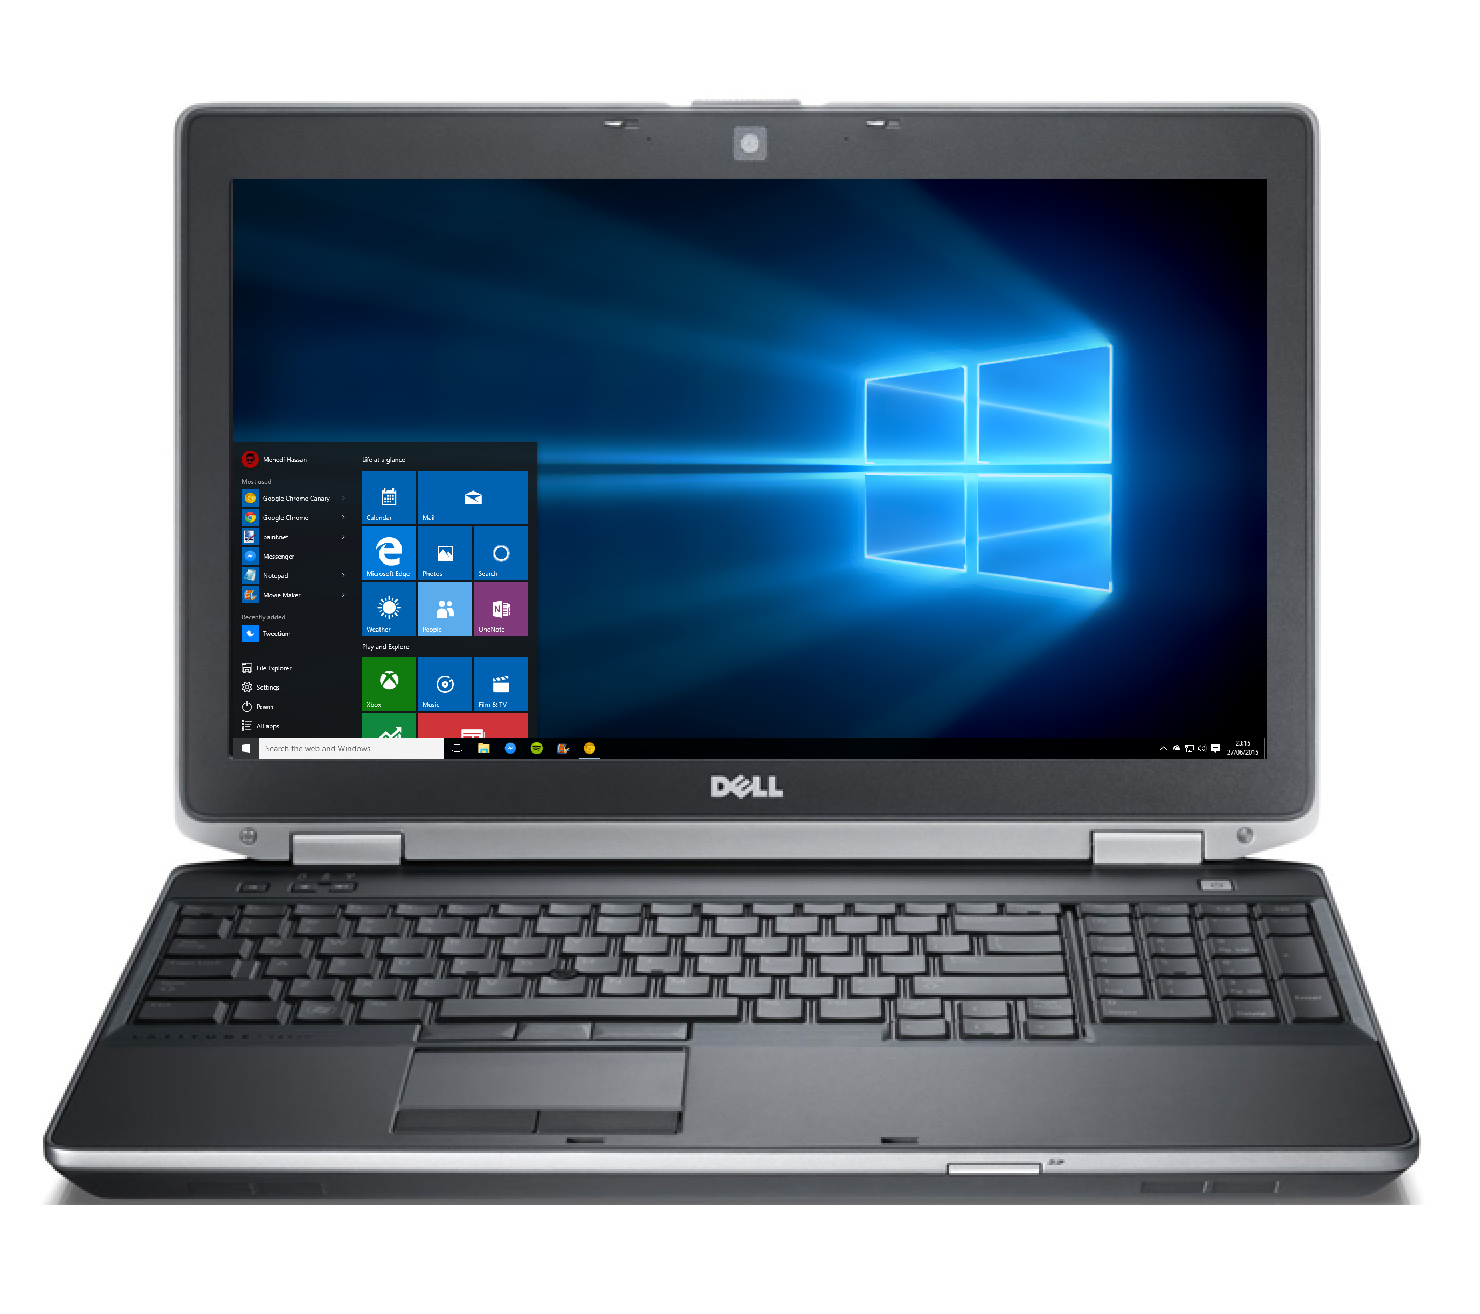 "Dell Latitude Laptop 15.6"" Intel i5 2TB SSD 🚩16GB RAM 🚩WiFI HDMI + Win 10 Pro 3"